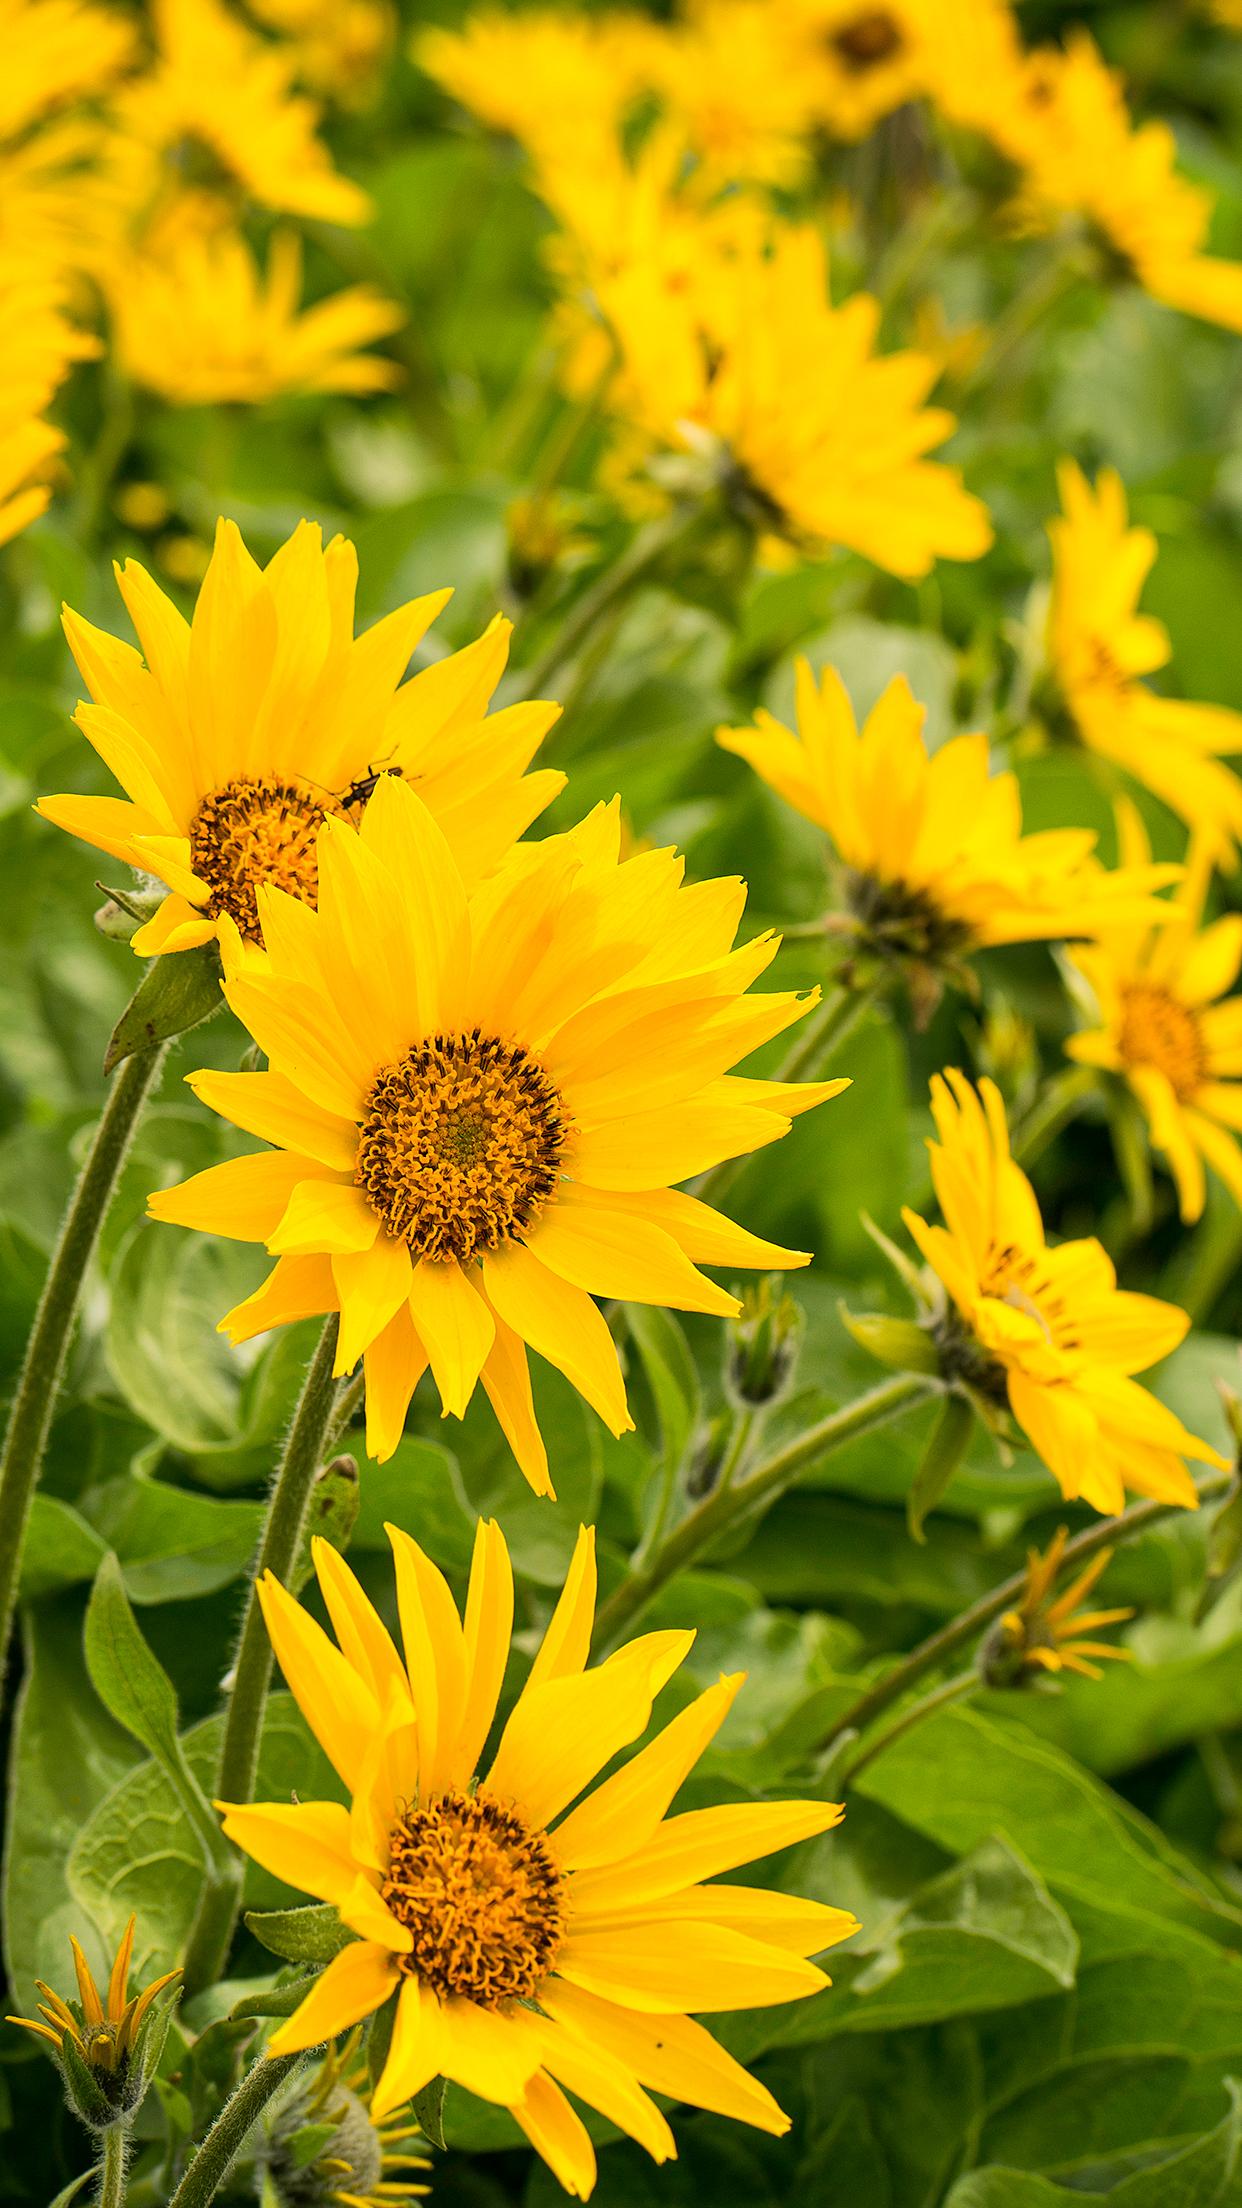 Wasim Muklashy_Sunflowers_Columbia River Gorge_Oregon_iPhone6Plus